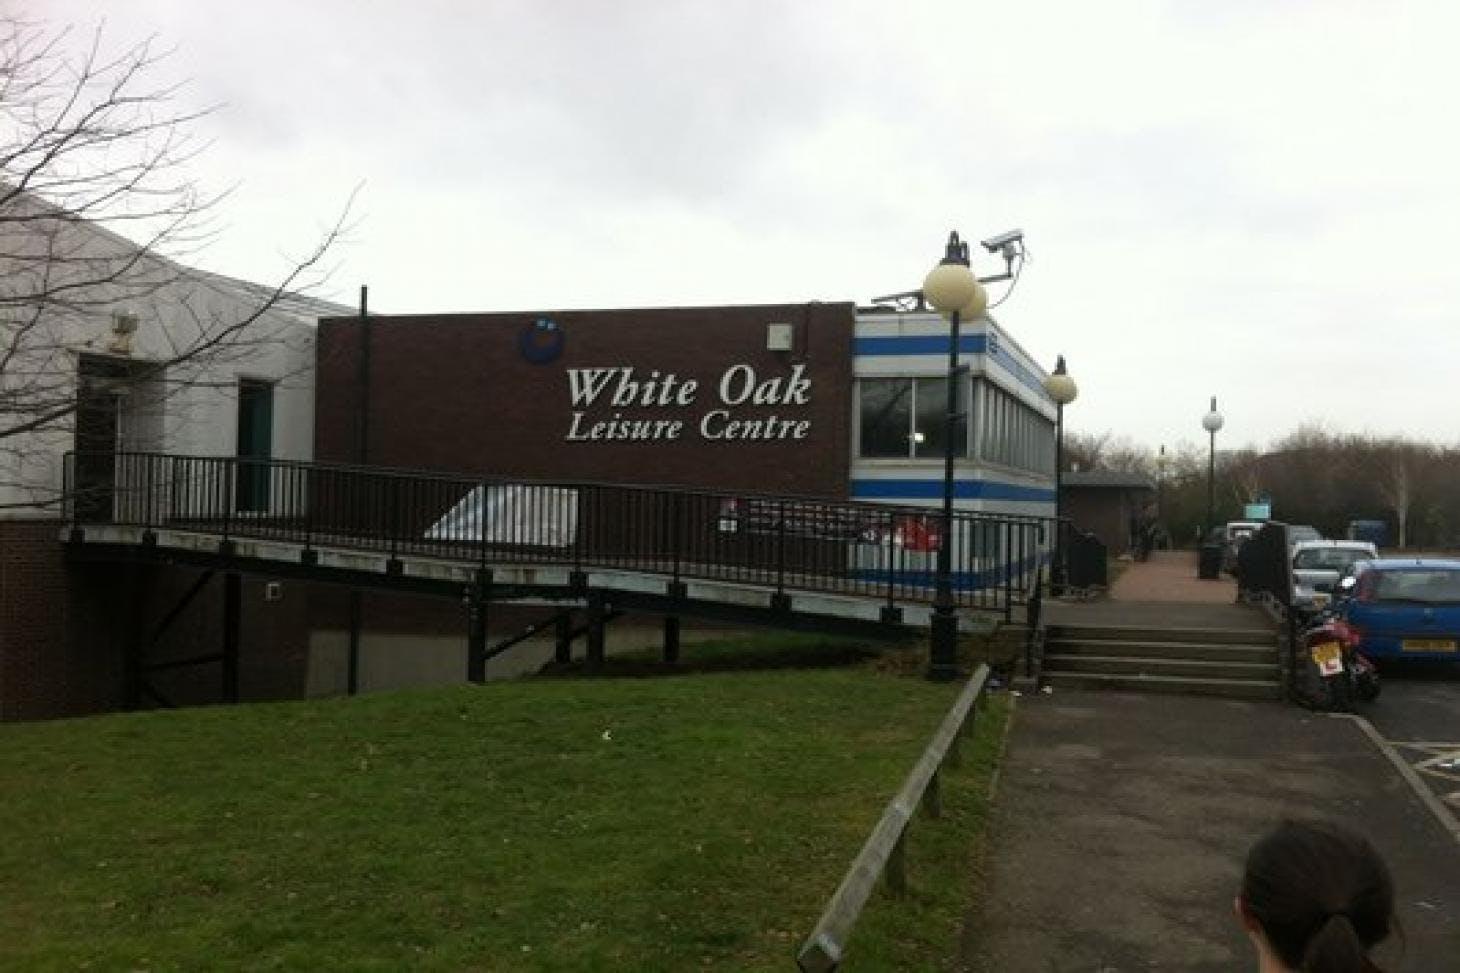 White Oak Leisure Centre Gym gym